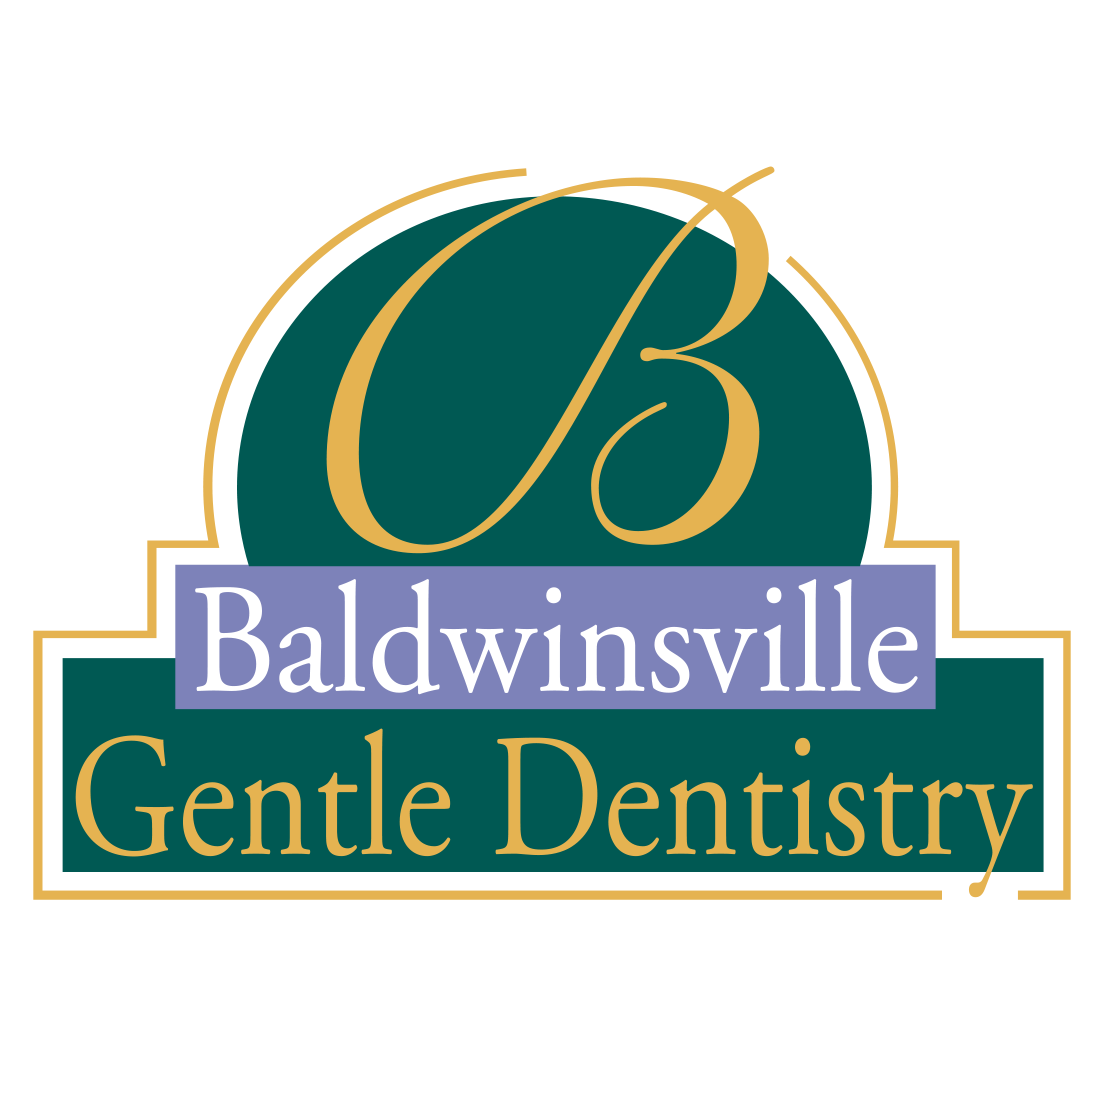 Baldwinsville Gentle Dentistry - Baldwinsville, NY - Dentists & Dental Services